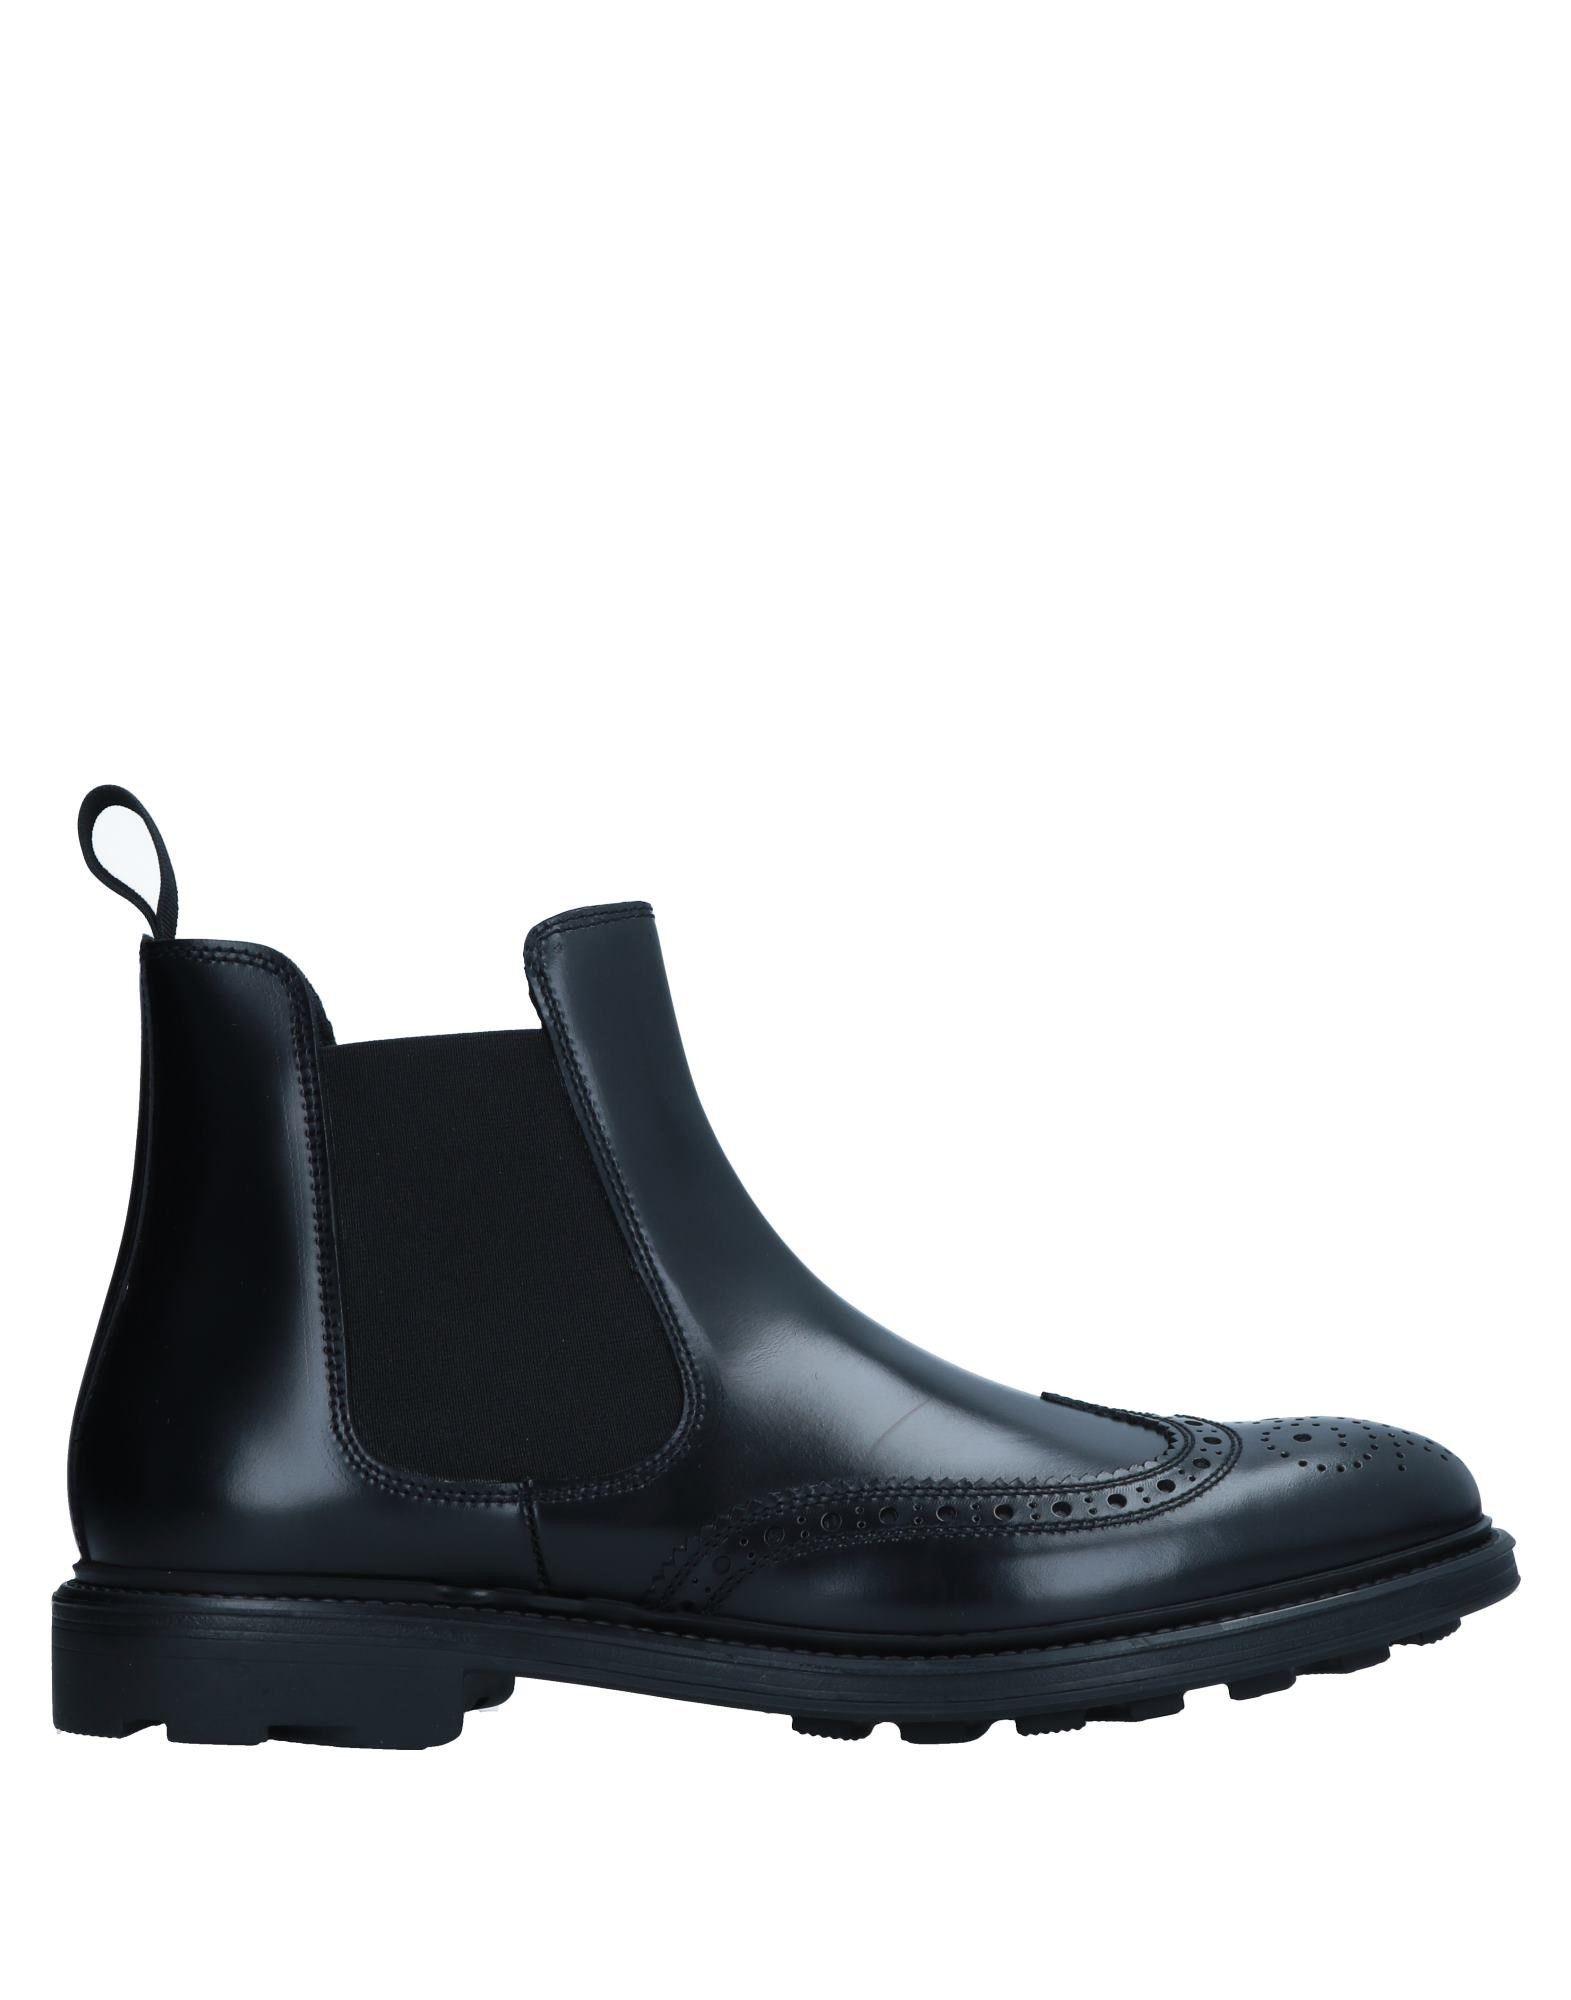 Doucal's Stiefelette Herren  11544397UL Gute Qualität beliebte Schuhe